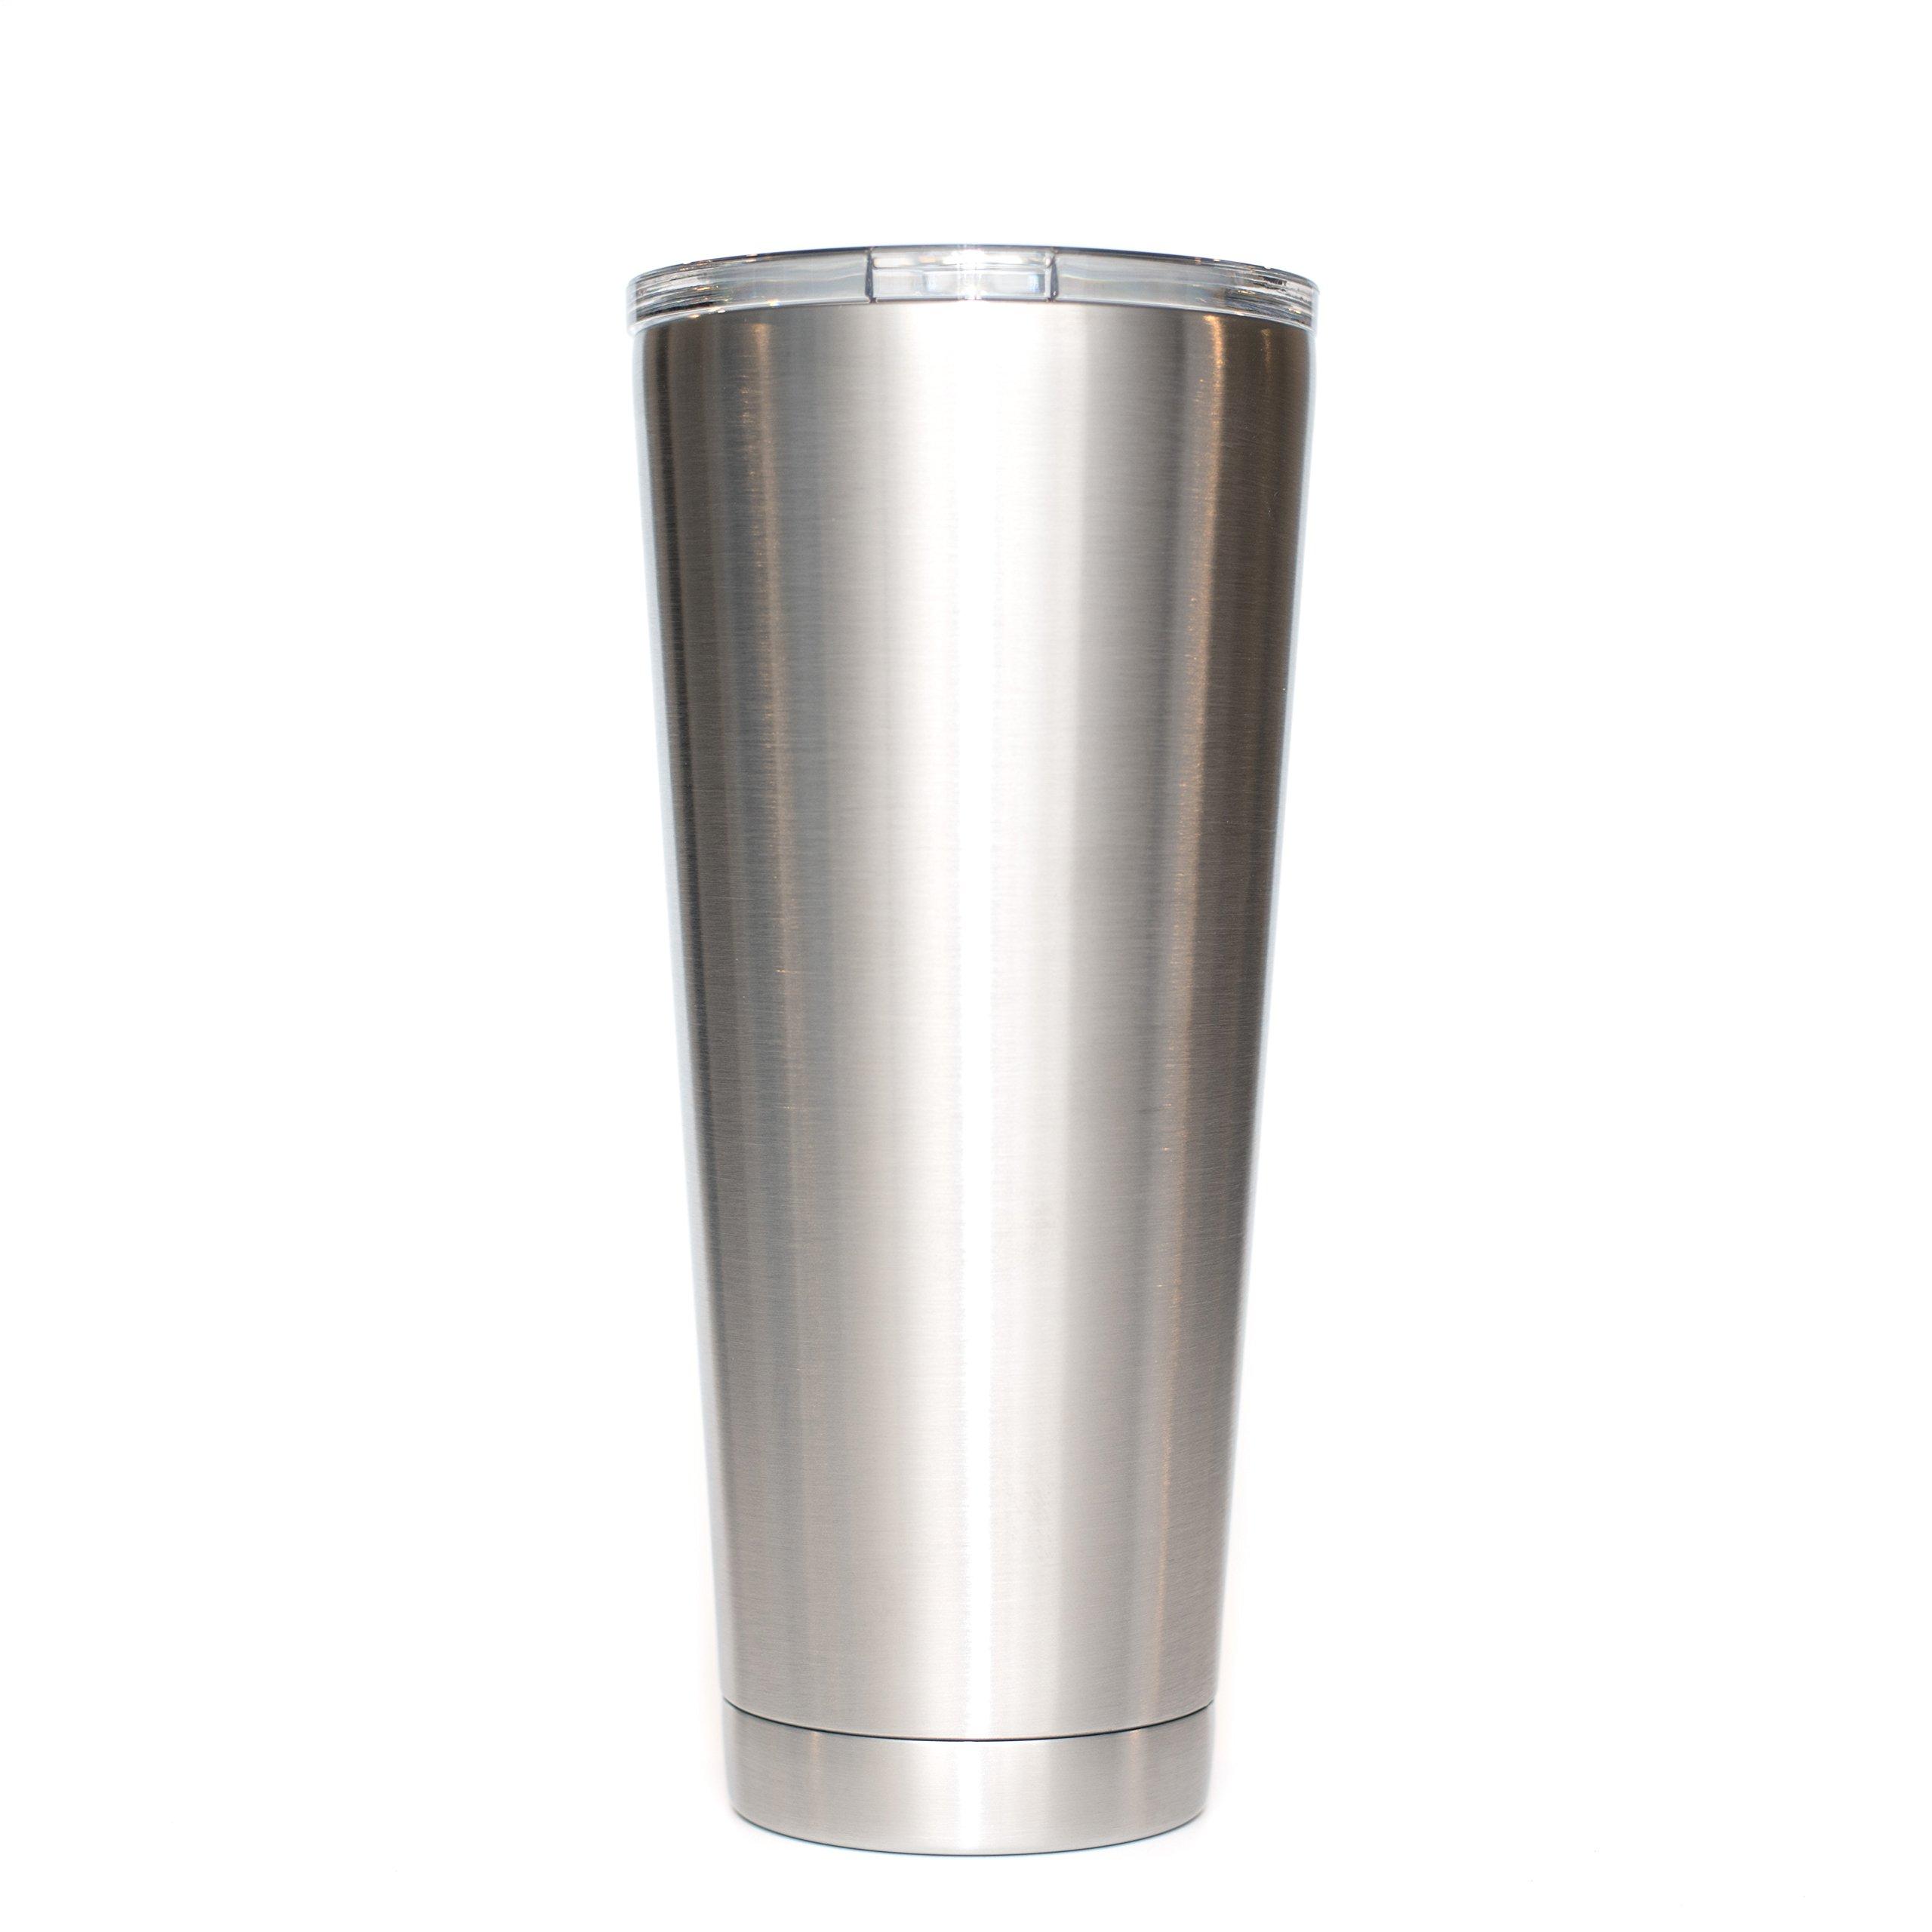 FIREKI Tumbler (32 oz, Stainless Steel)